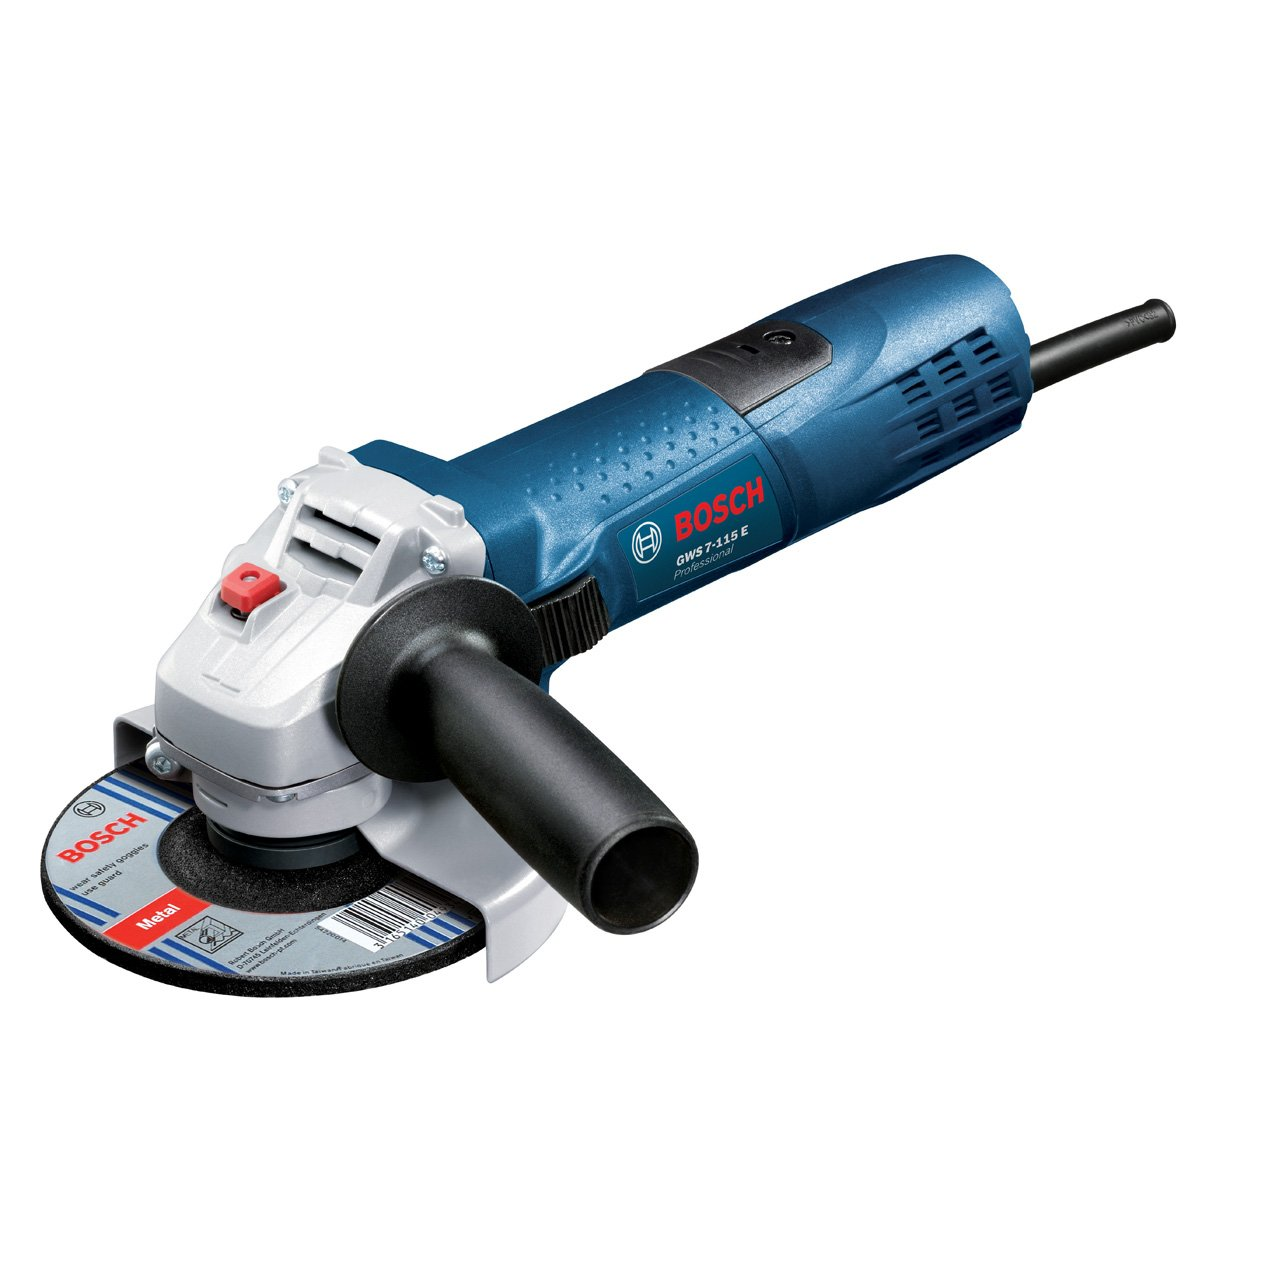 Bosch 0601388201 GWS 7-115 Smerigliatrice Eletronic product image